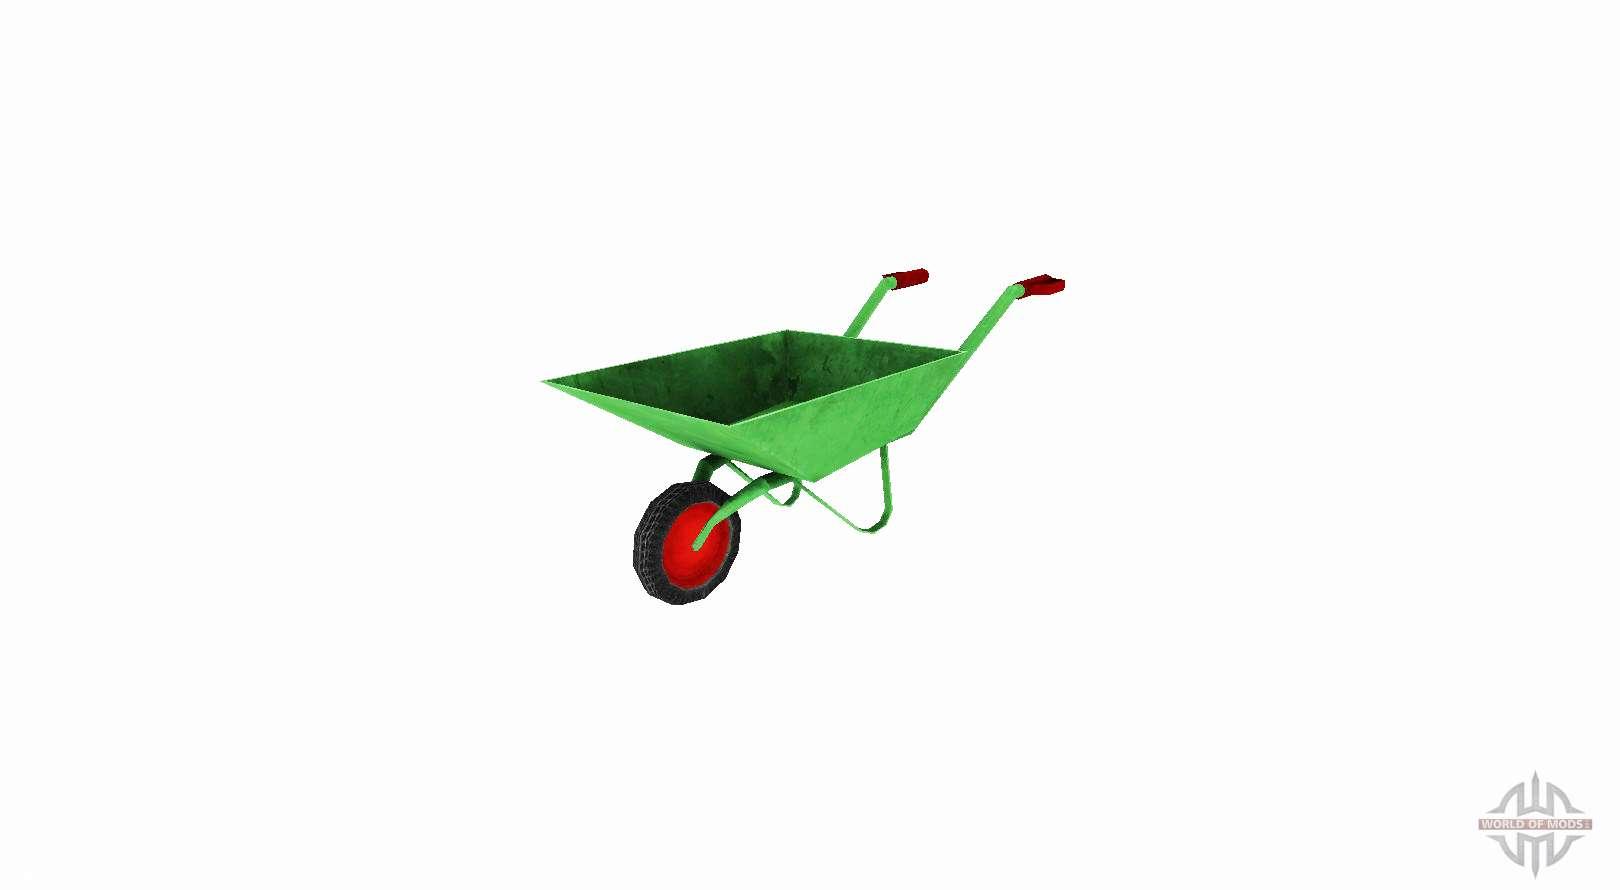 Jard n carretilla de mano para farming simulator 2017 for Carretillas para jardin